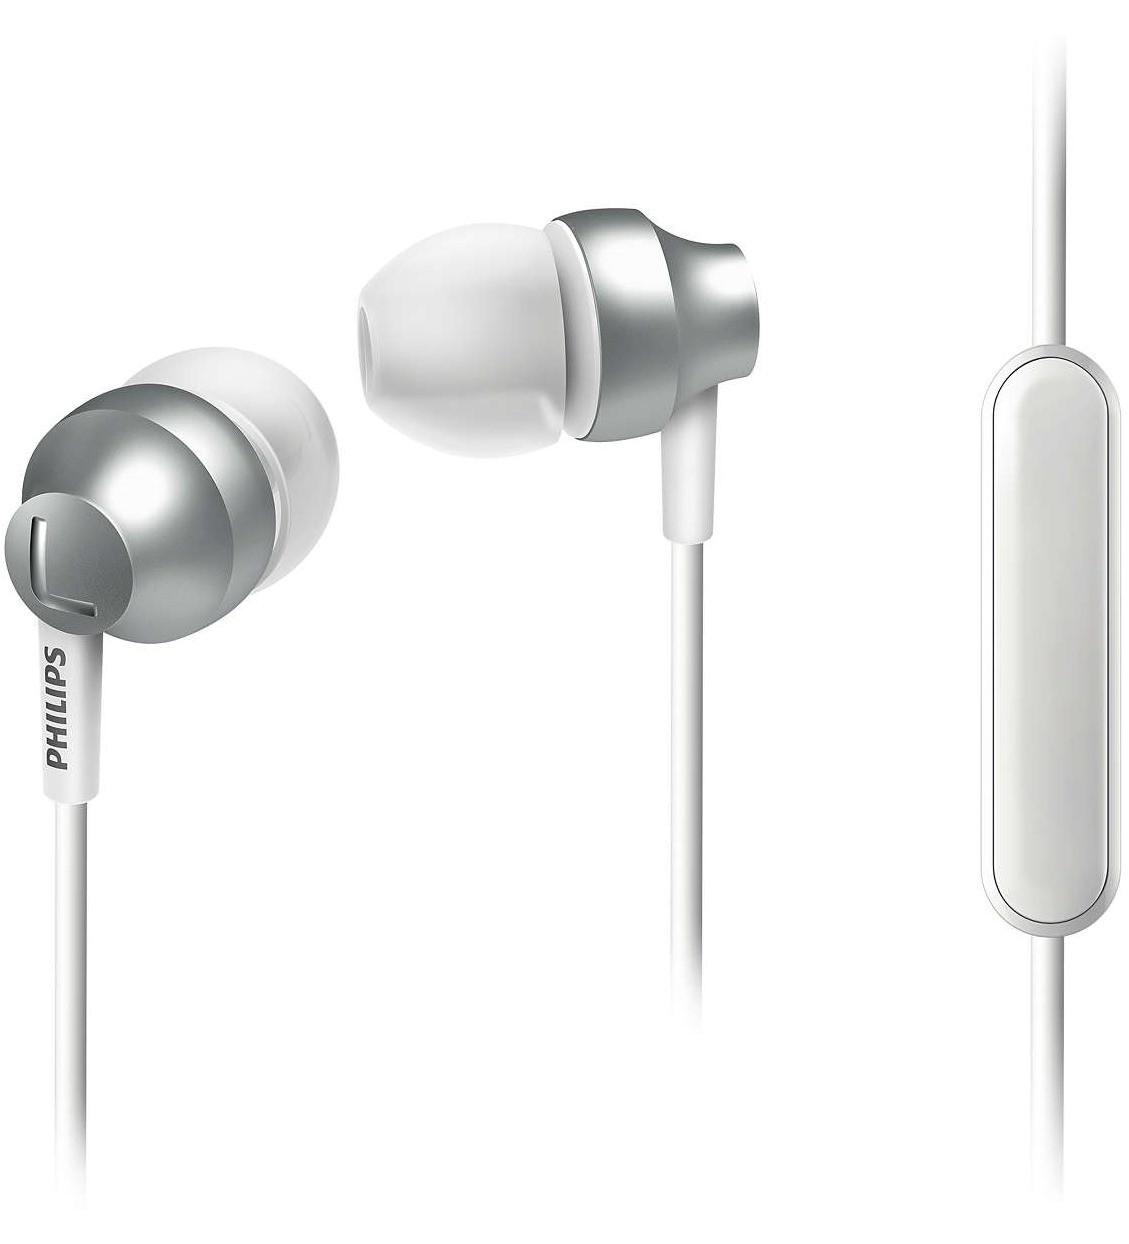 Philips She3855 Jgos17 In Ear Headphone With Mic She1405 Black E Katalog